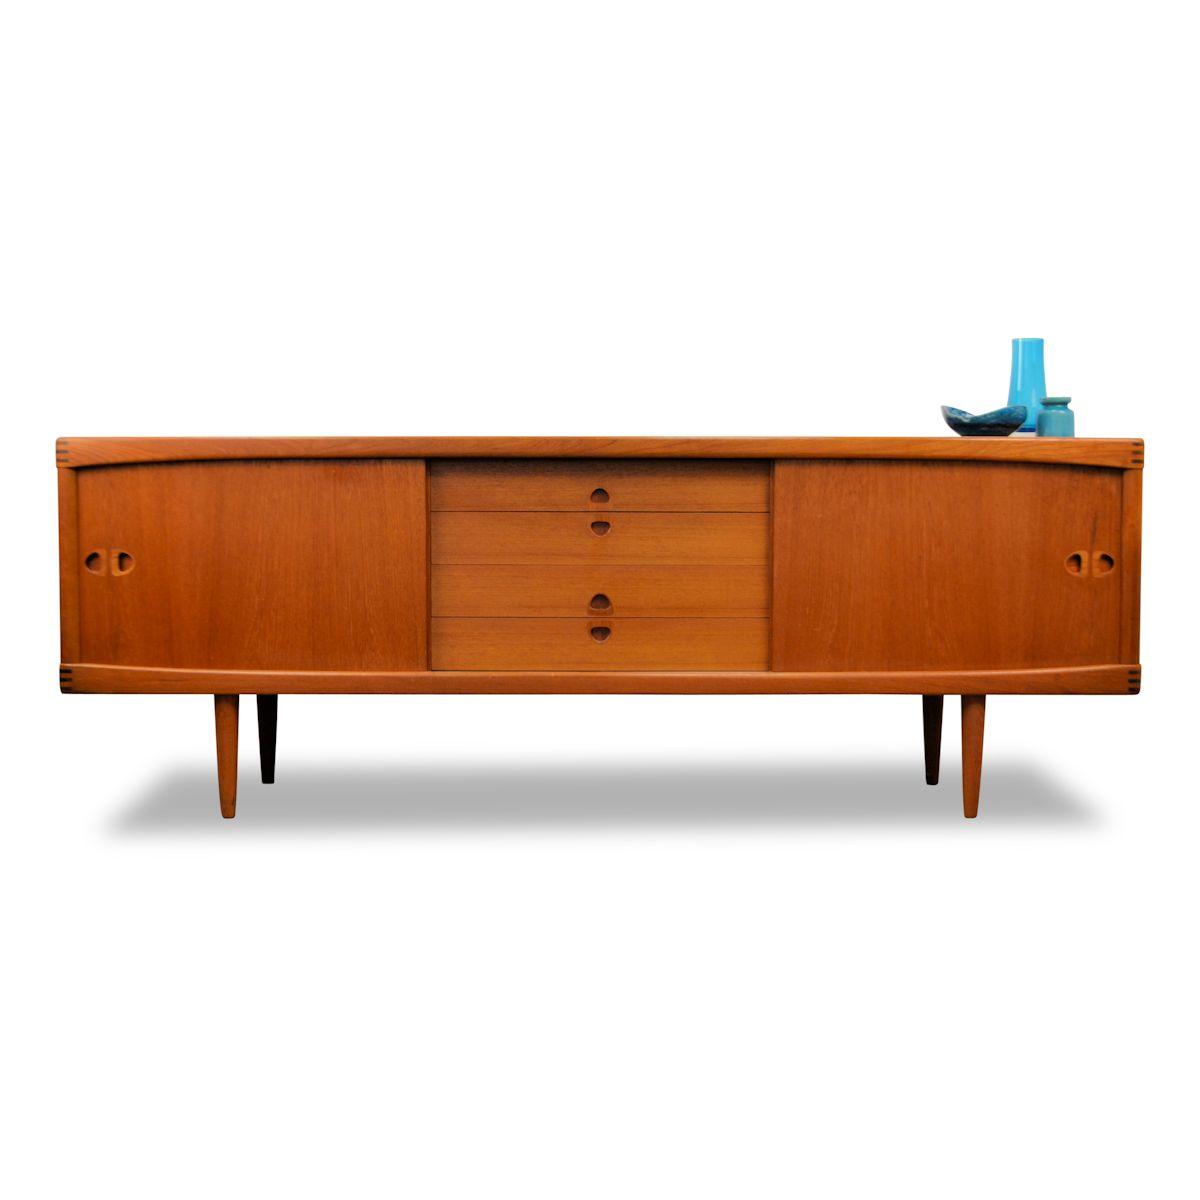 Vintage H.W. Klein voor Bramin teak dressoir